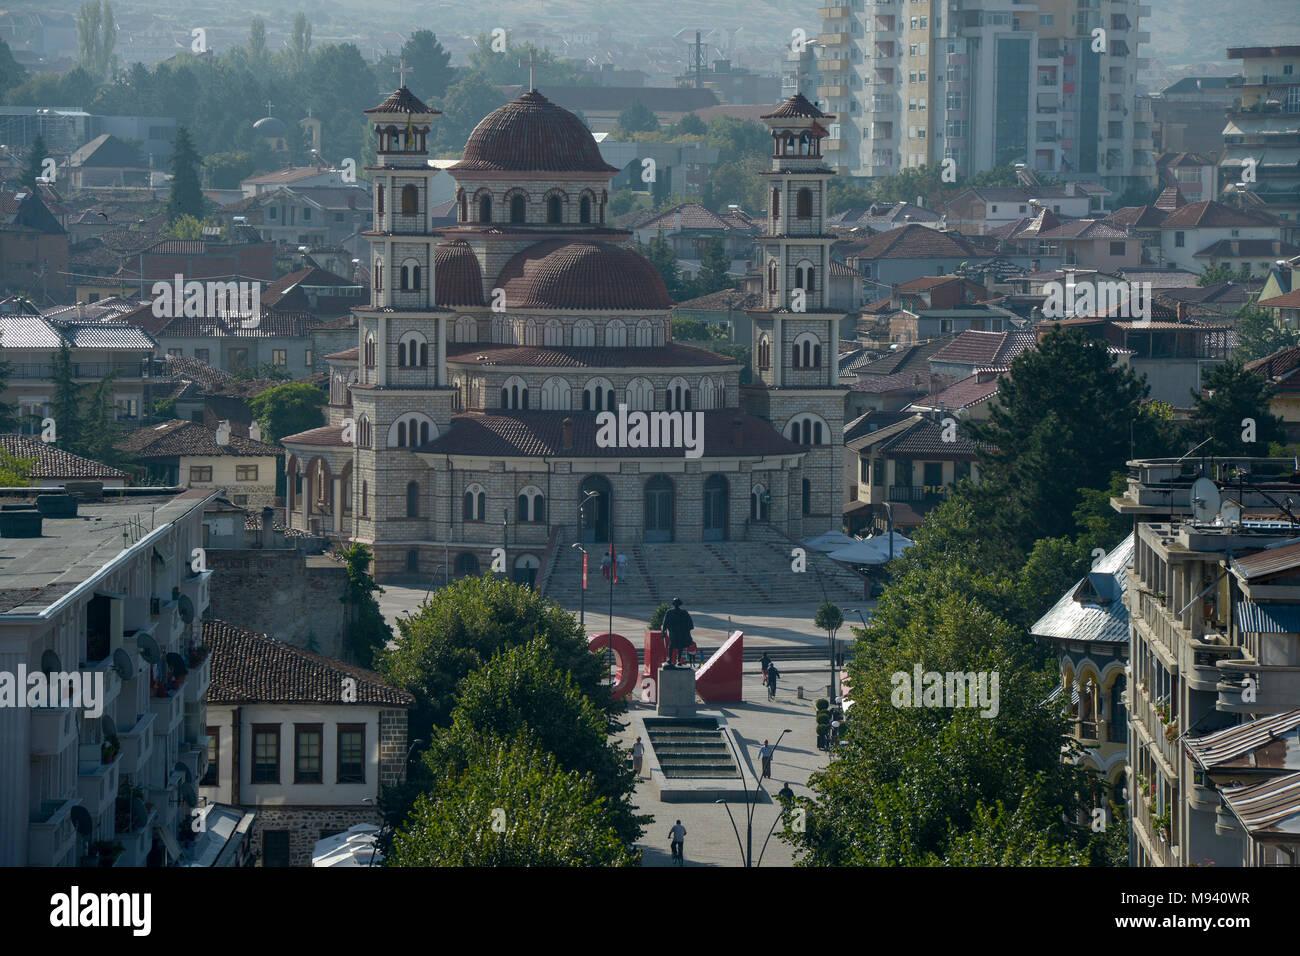 ALBANIA, Korça, orthodox cathedral, built 1992-95 / ALBANIEN, Korca, orthodoxe Kathedrale - Stock Image